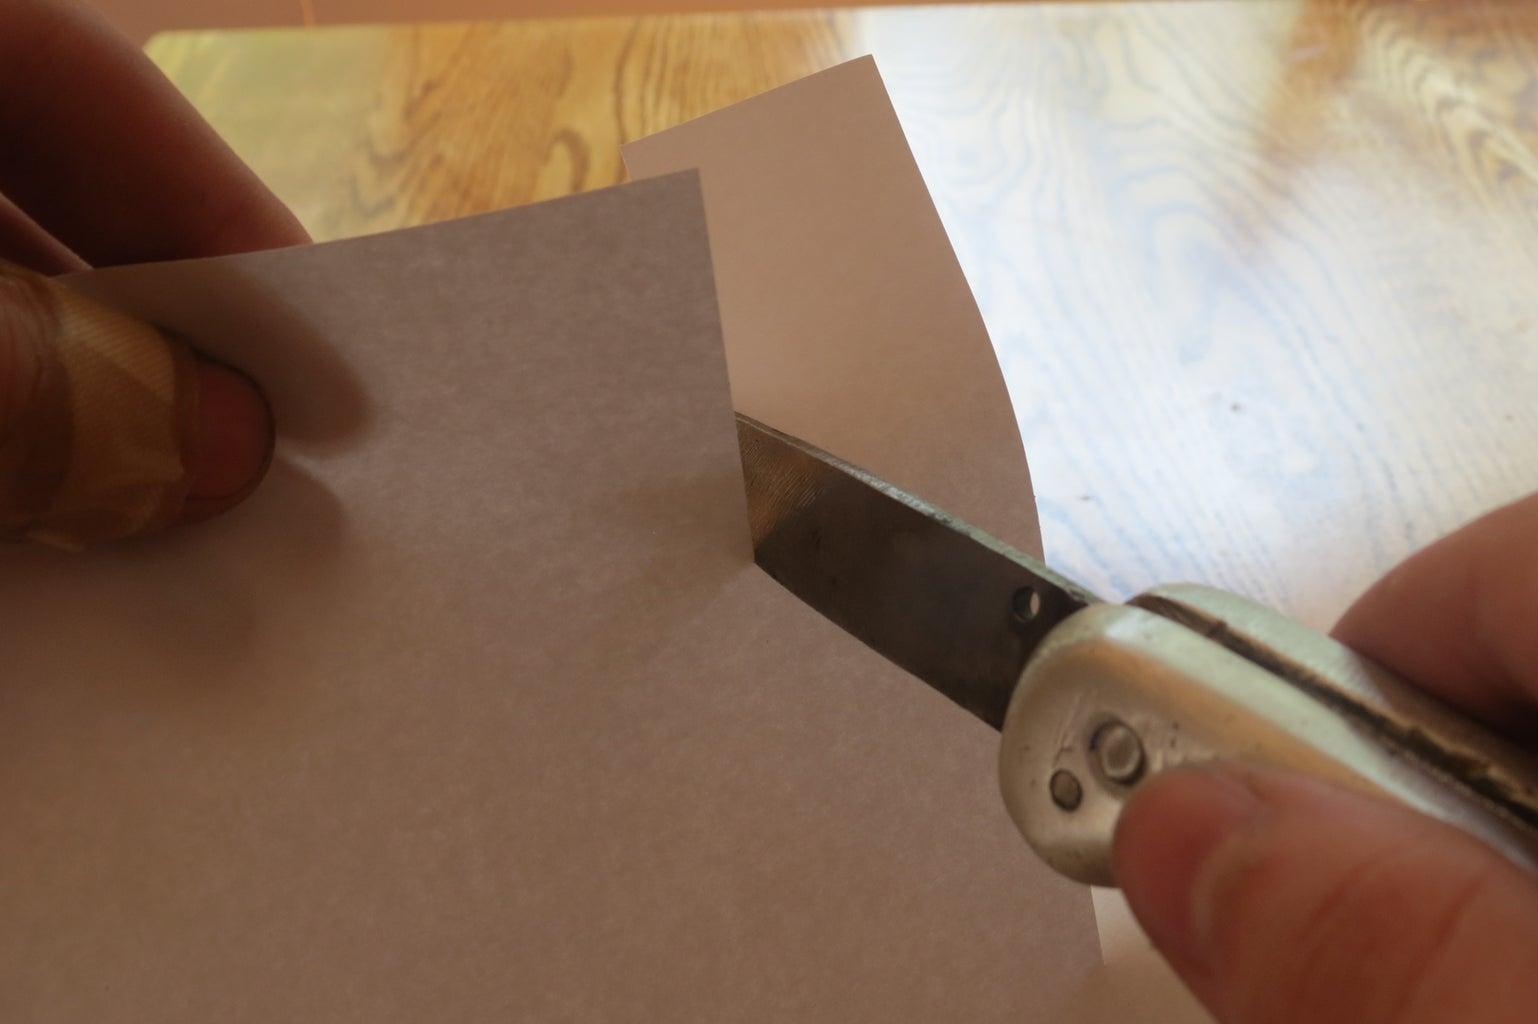 Folding Knife With Aluminium Handle